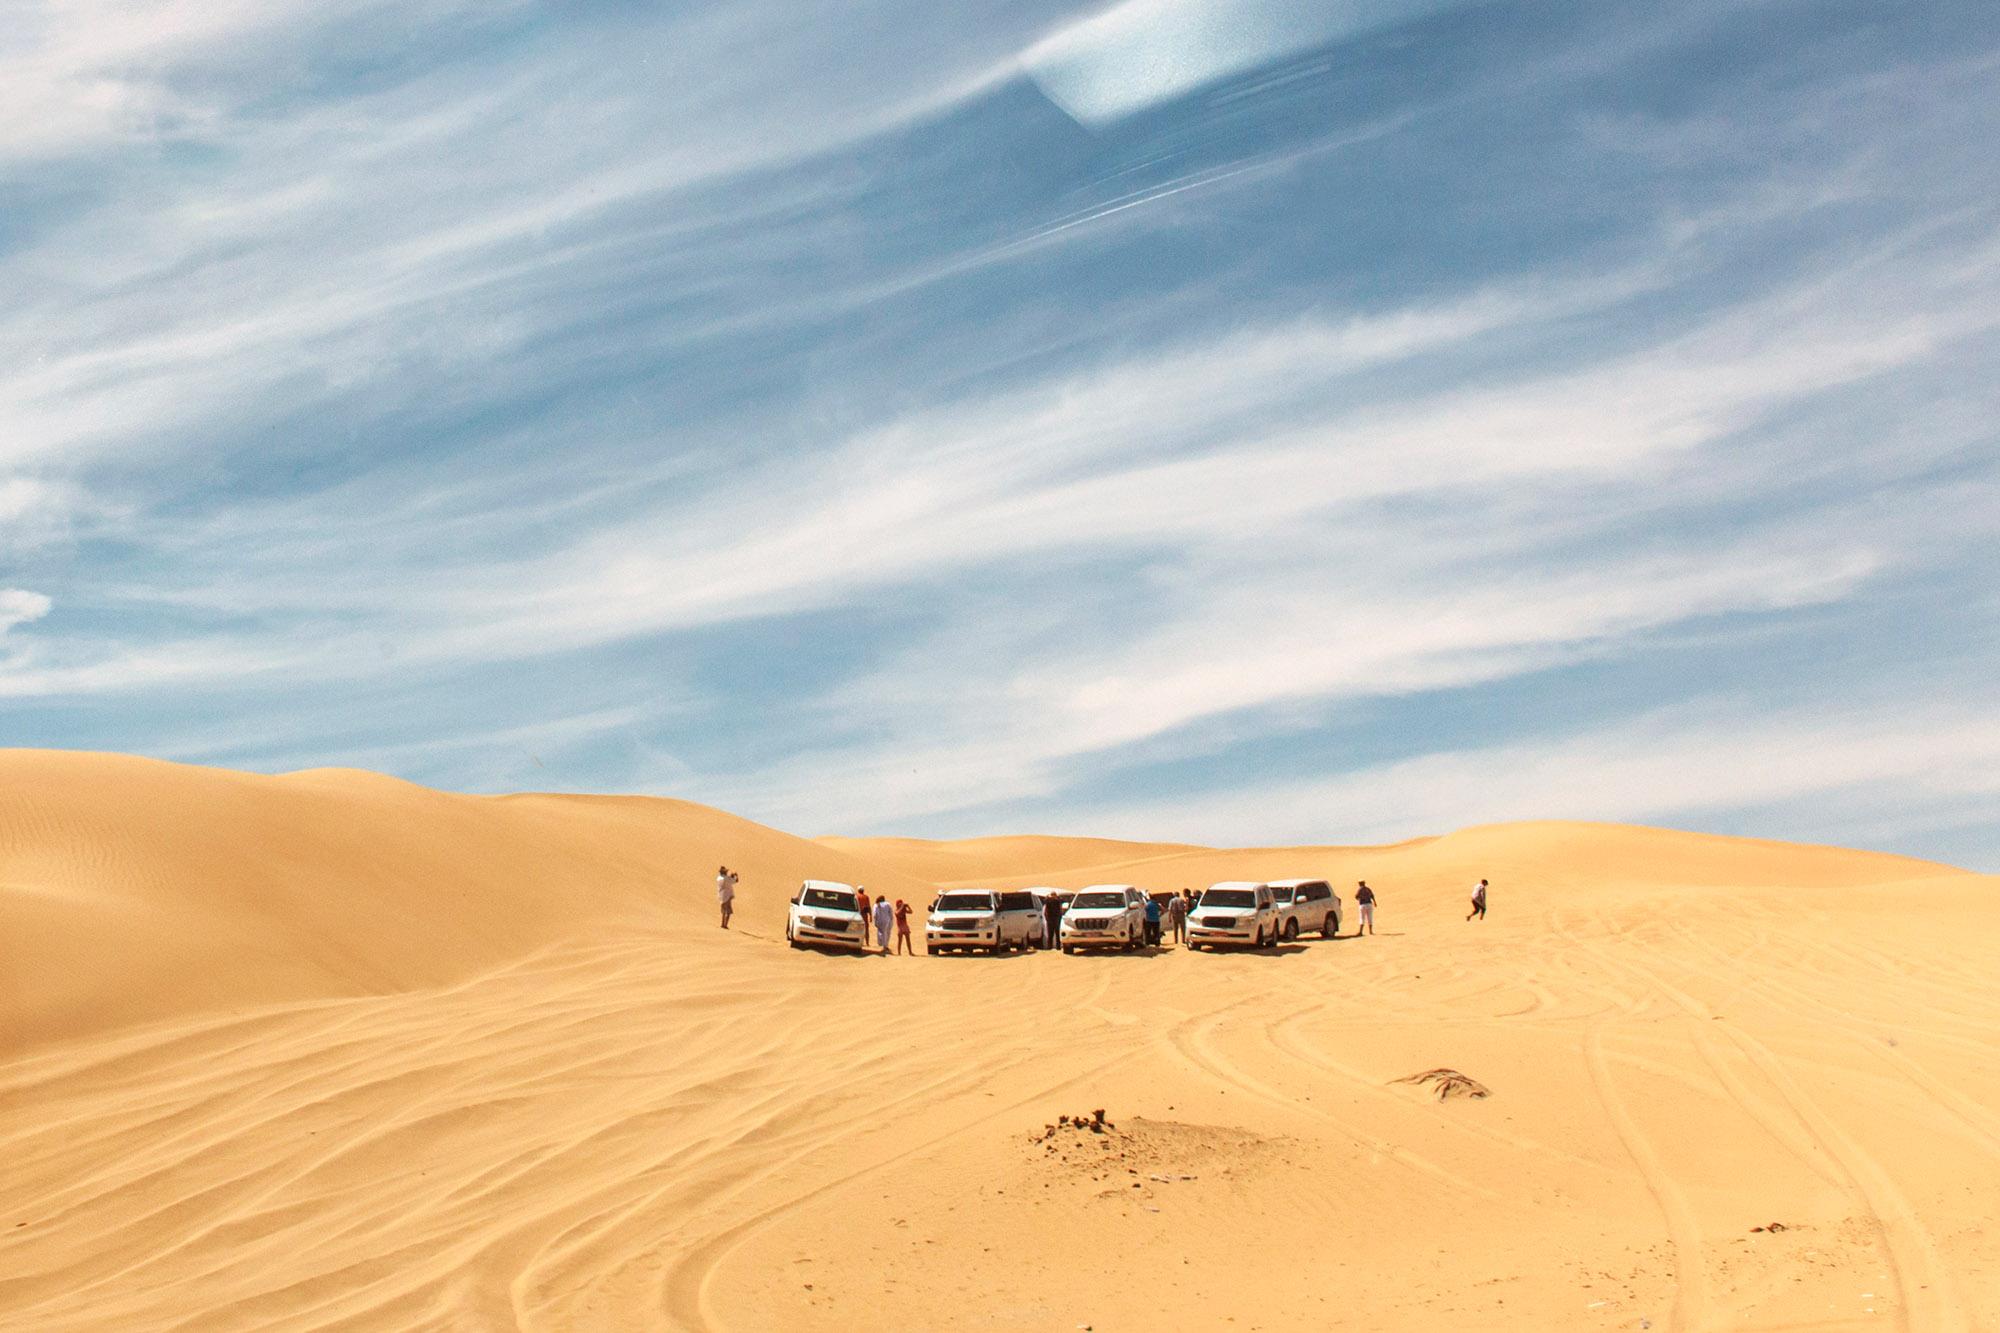 Jeeps traditional Safari Dune Bashing with tourists Oman Ubar in Desert Rub al Khali 11